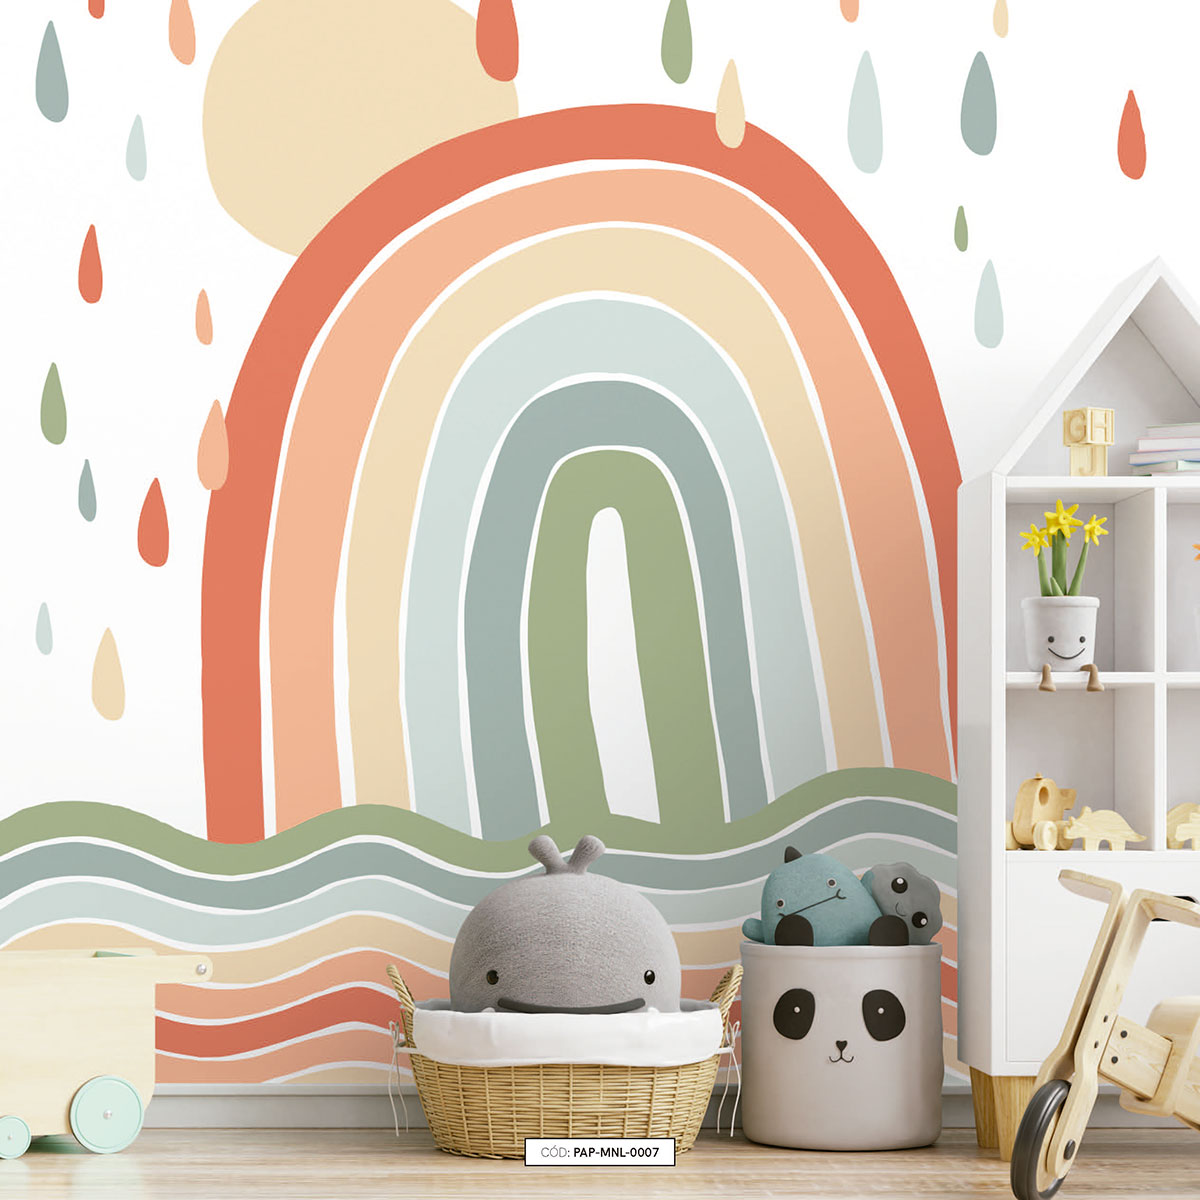 Painel de parede arcoiris com ondas colors